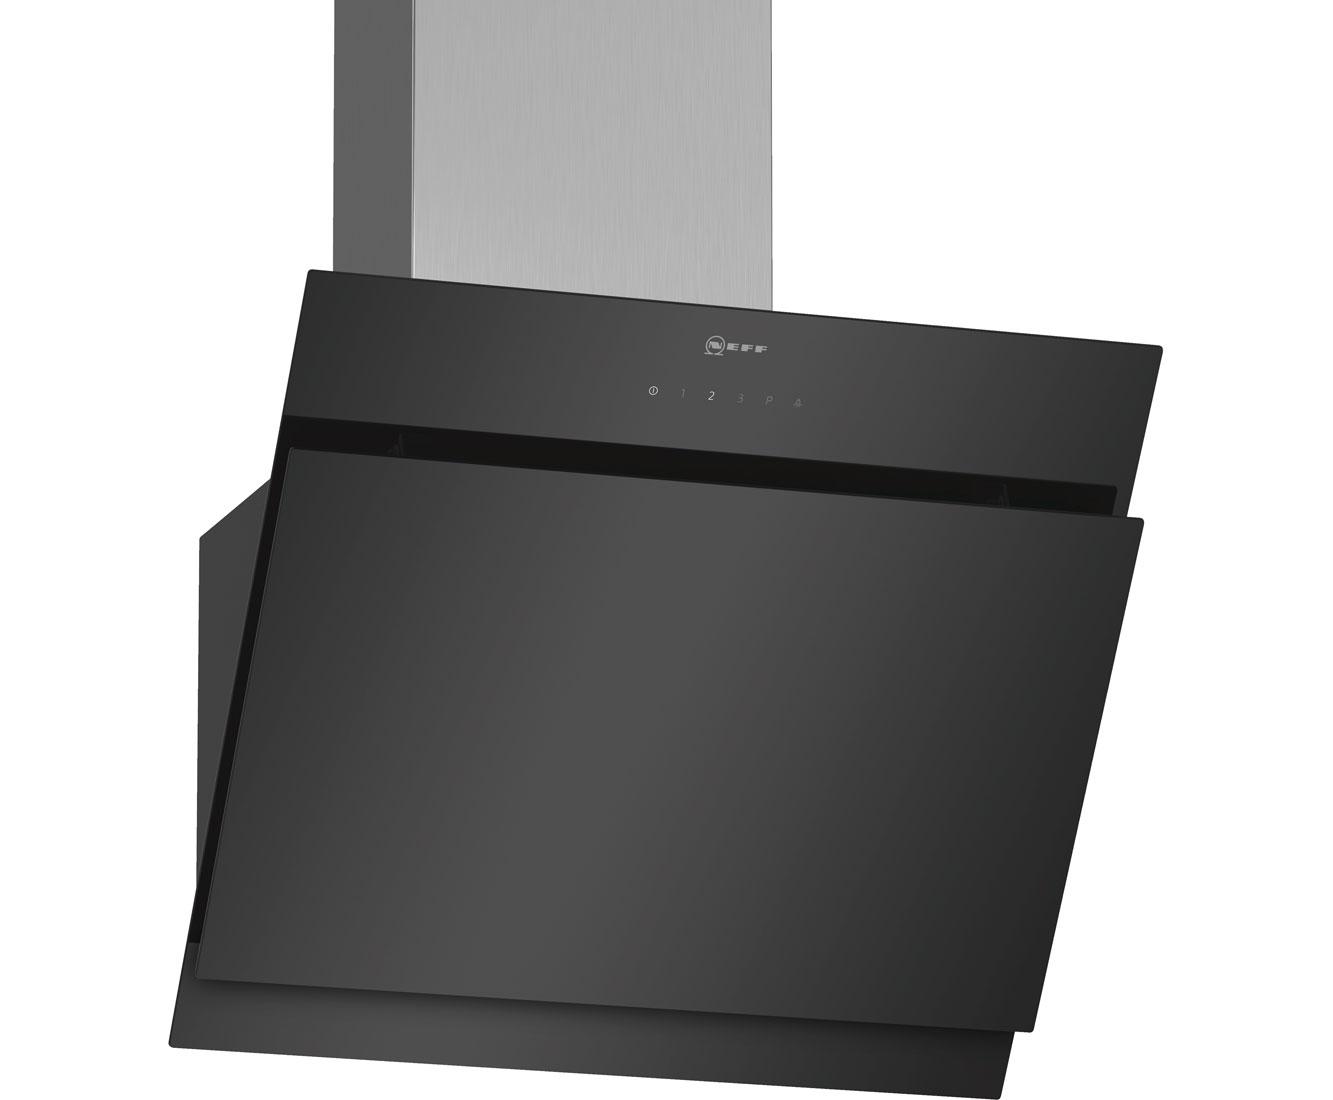 Neff dihm s dunstabzugshaube eingebaut cm schwarz edelstahl